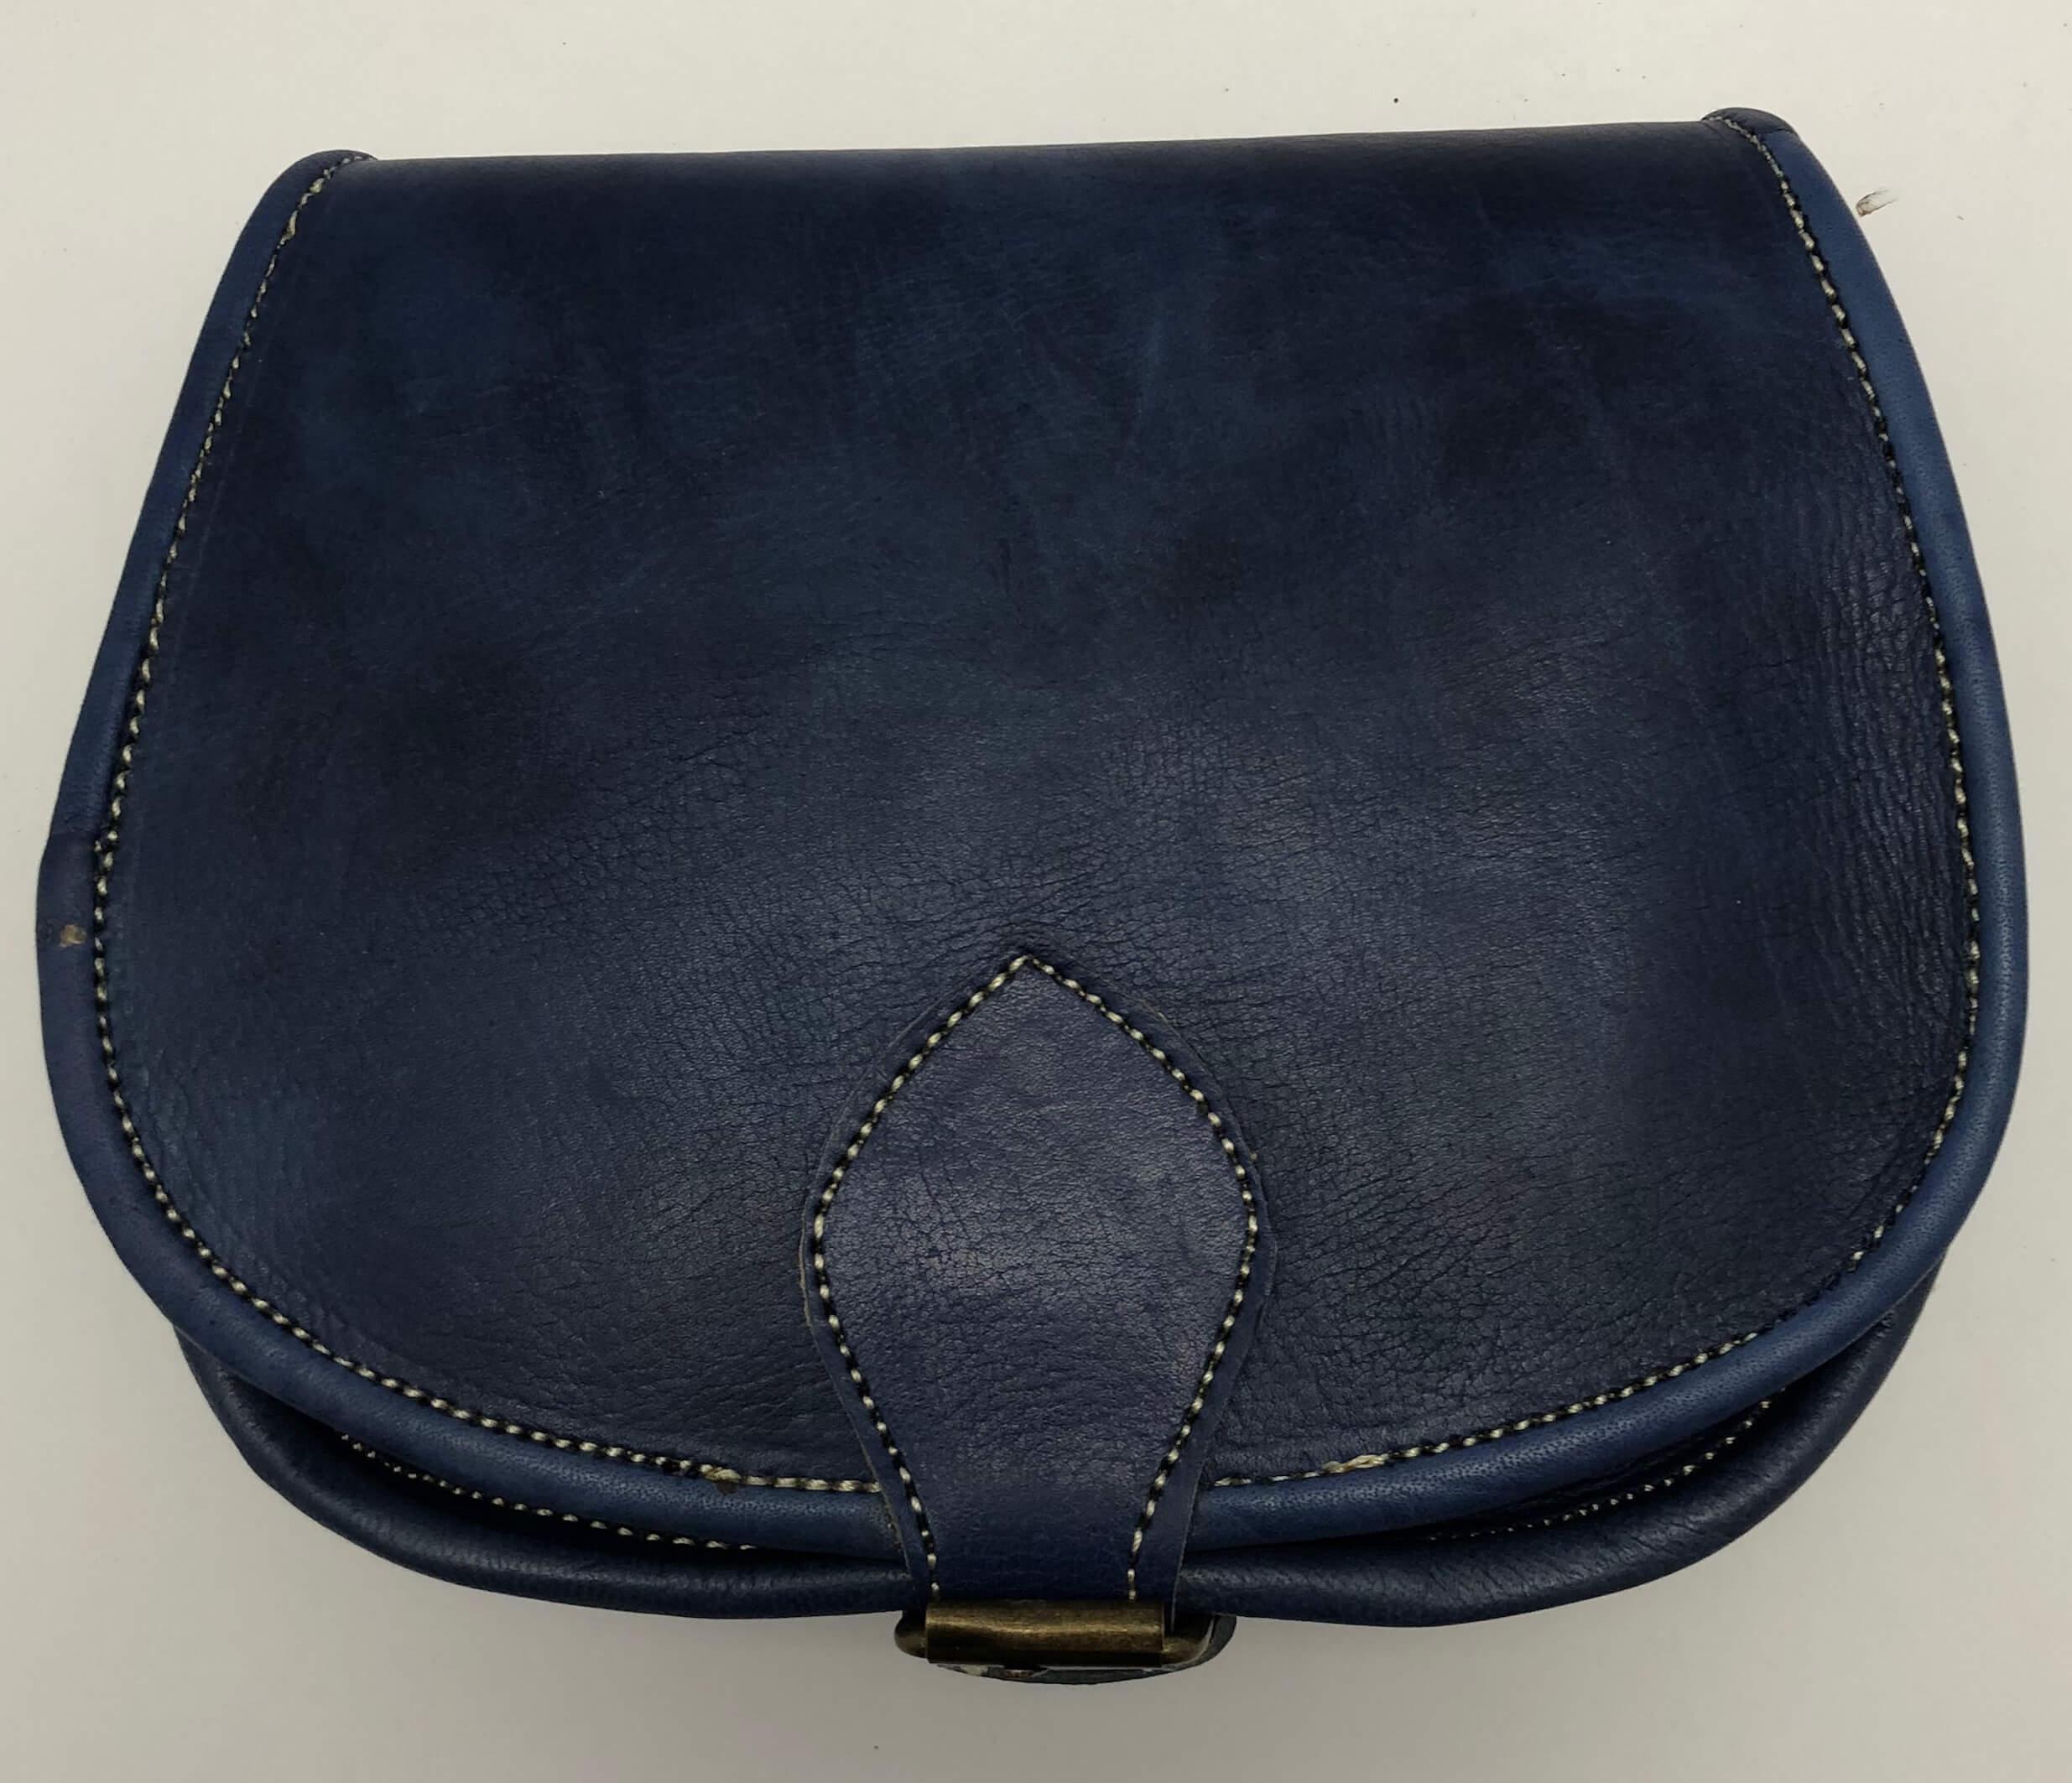 Kožená kabelka lovecká malá modrá 98be887b6fe